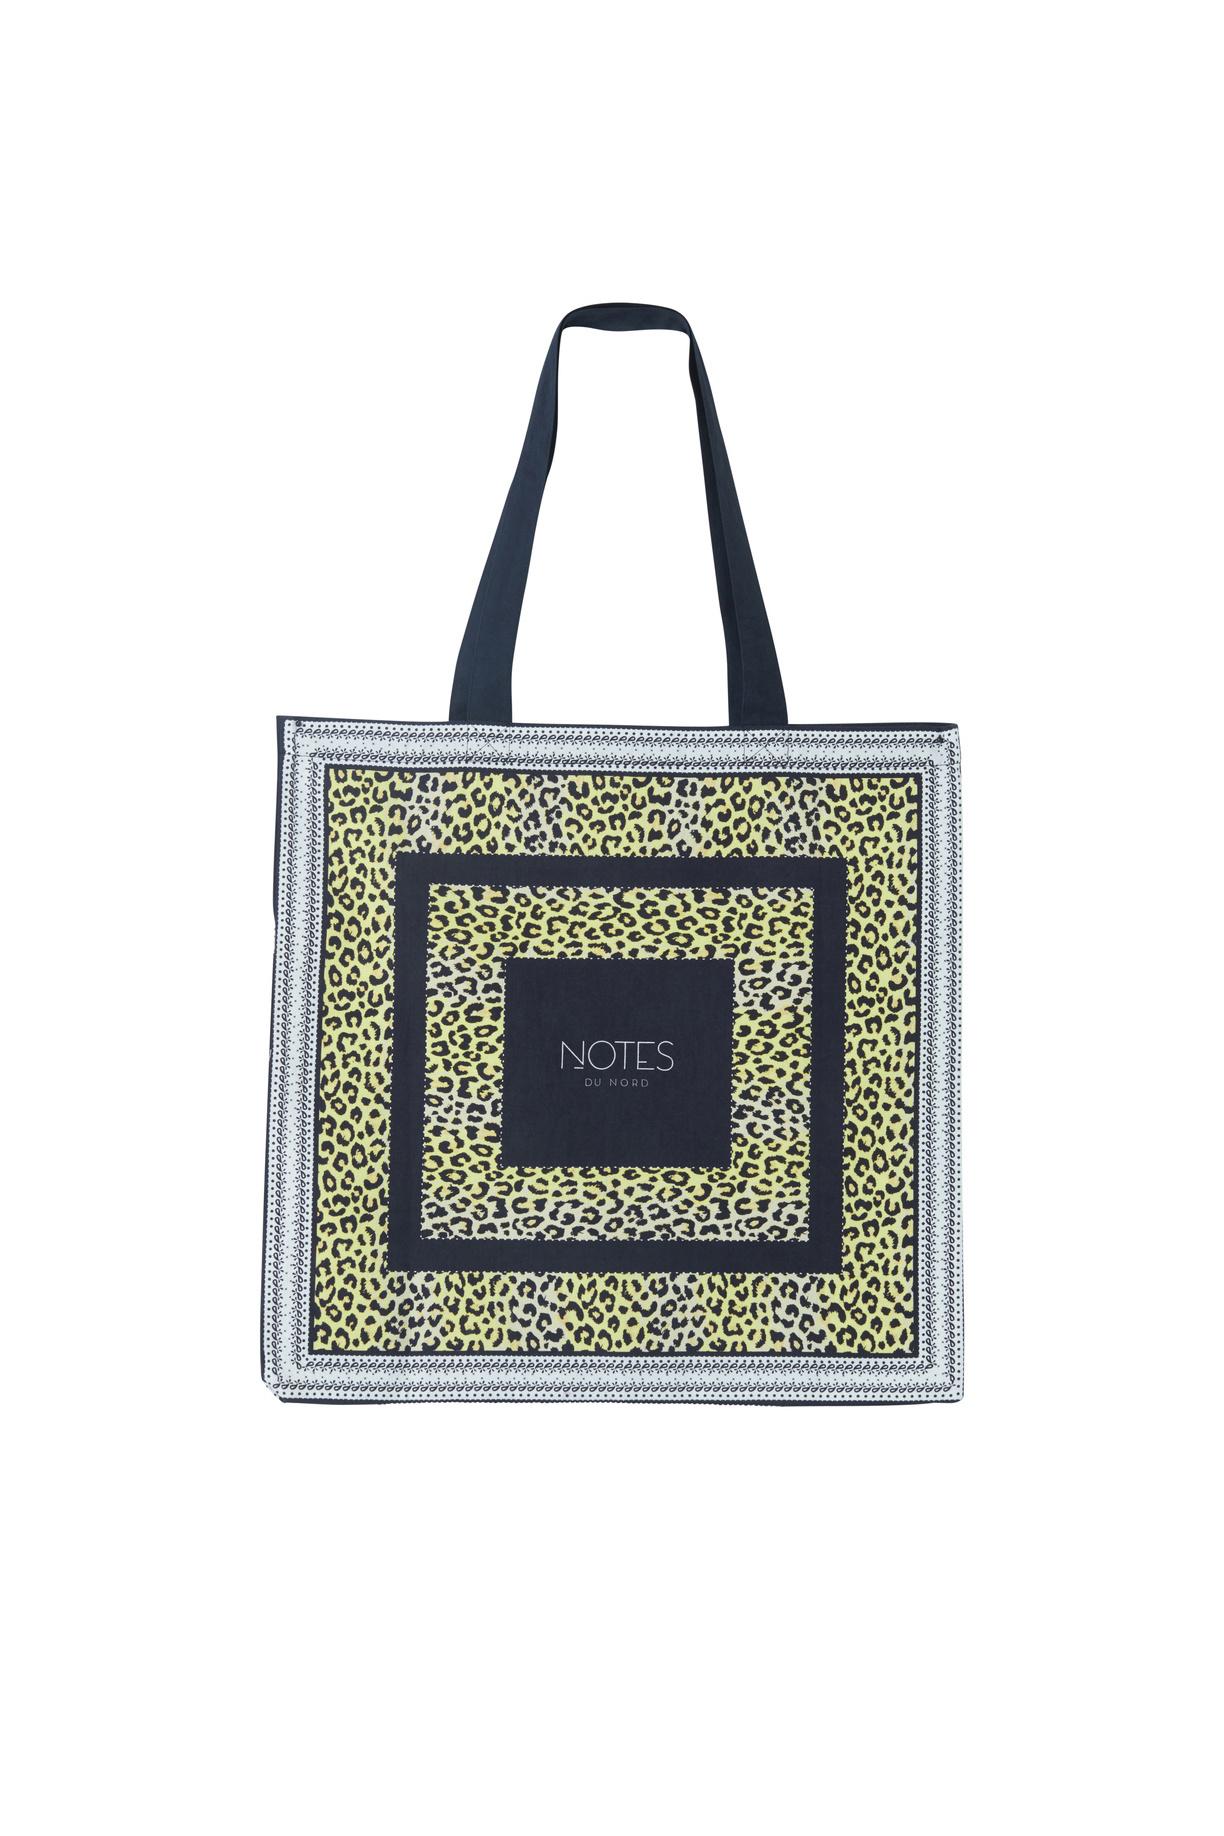 Olizzy Bag - Lemon Leopard-1